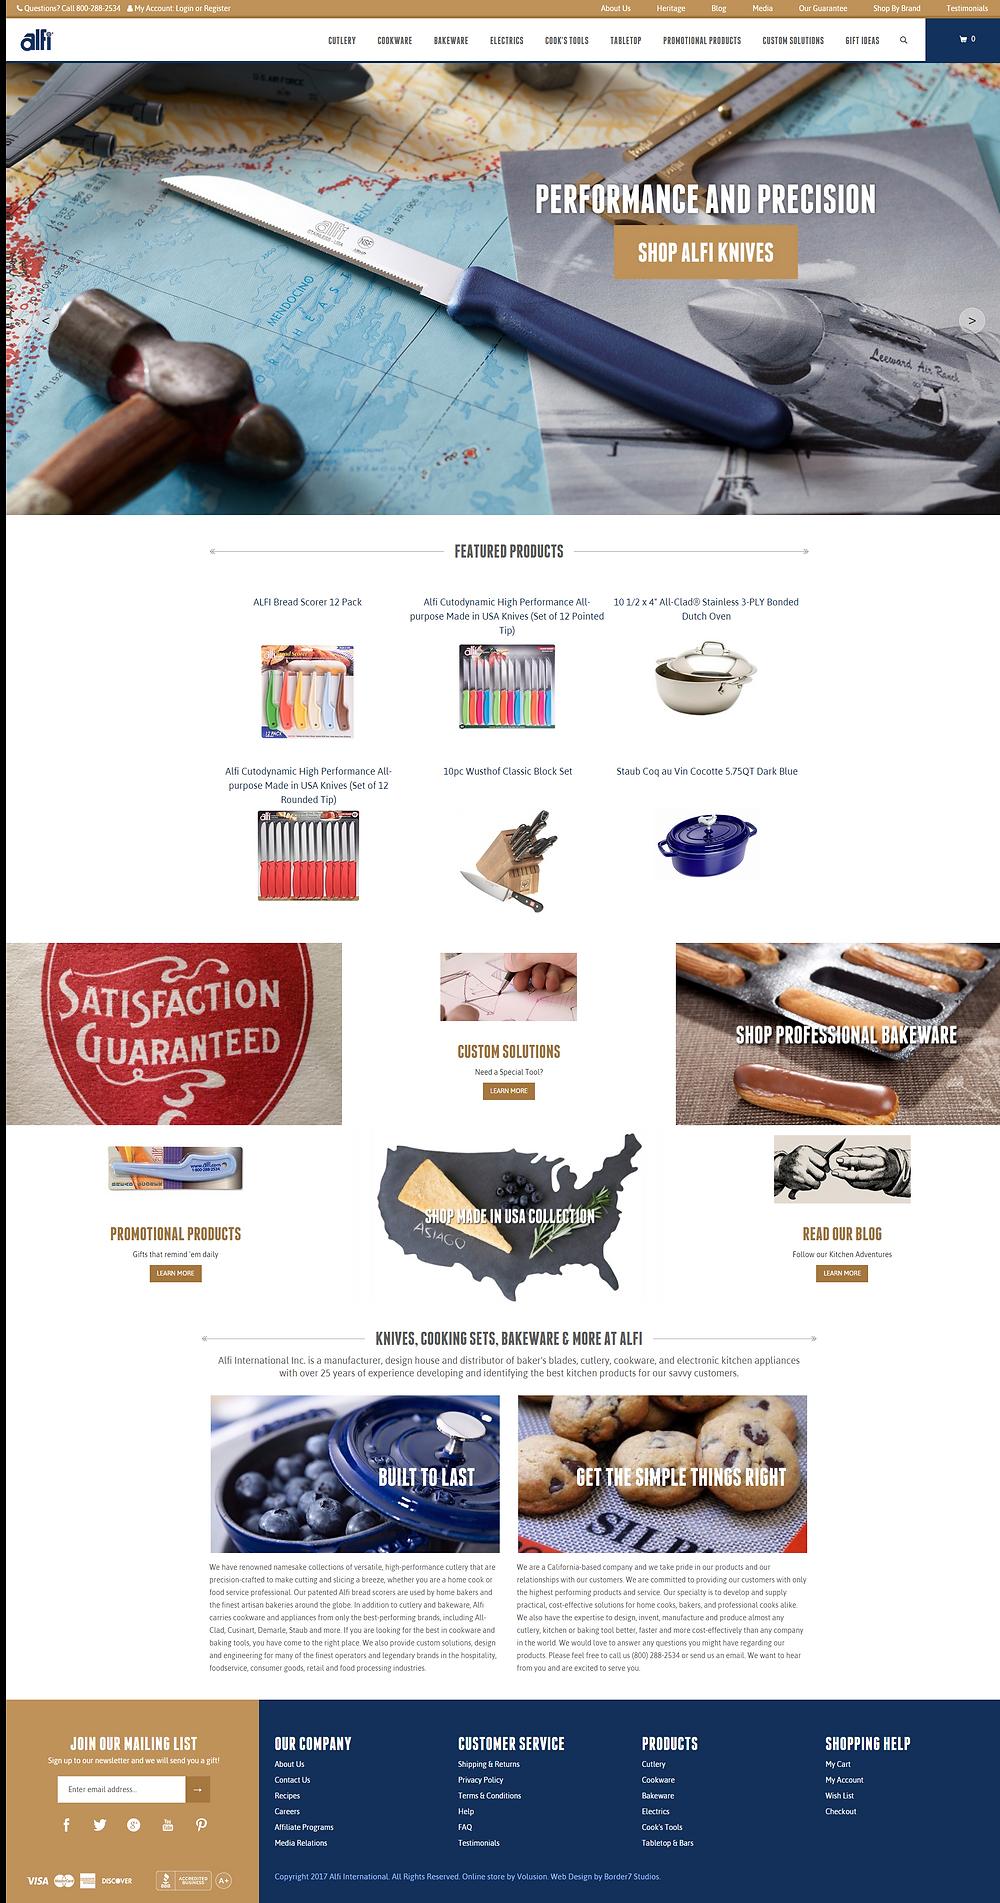 Screenshot of the new Alfi.com design